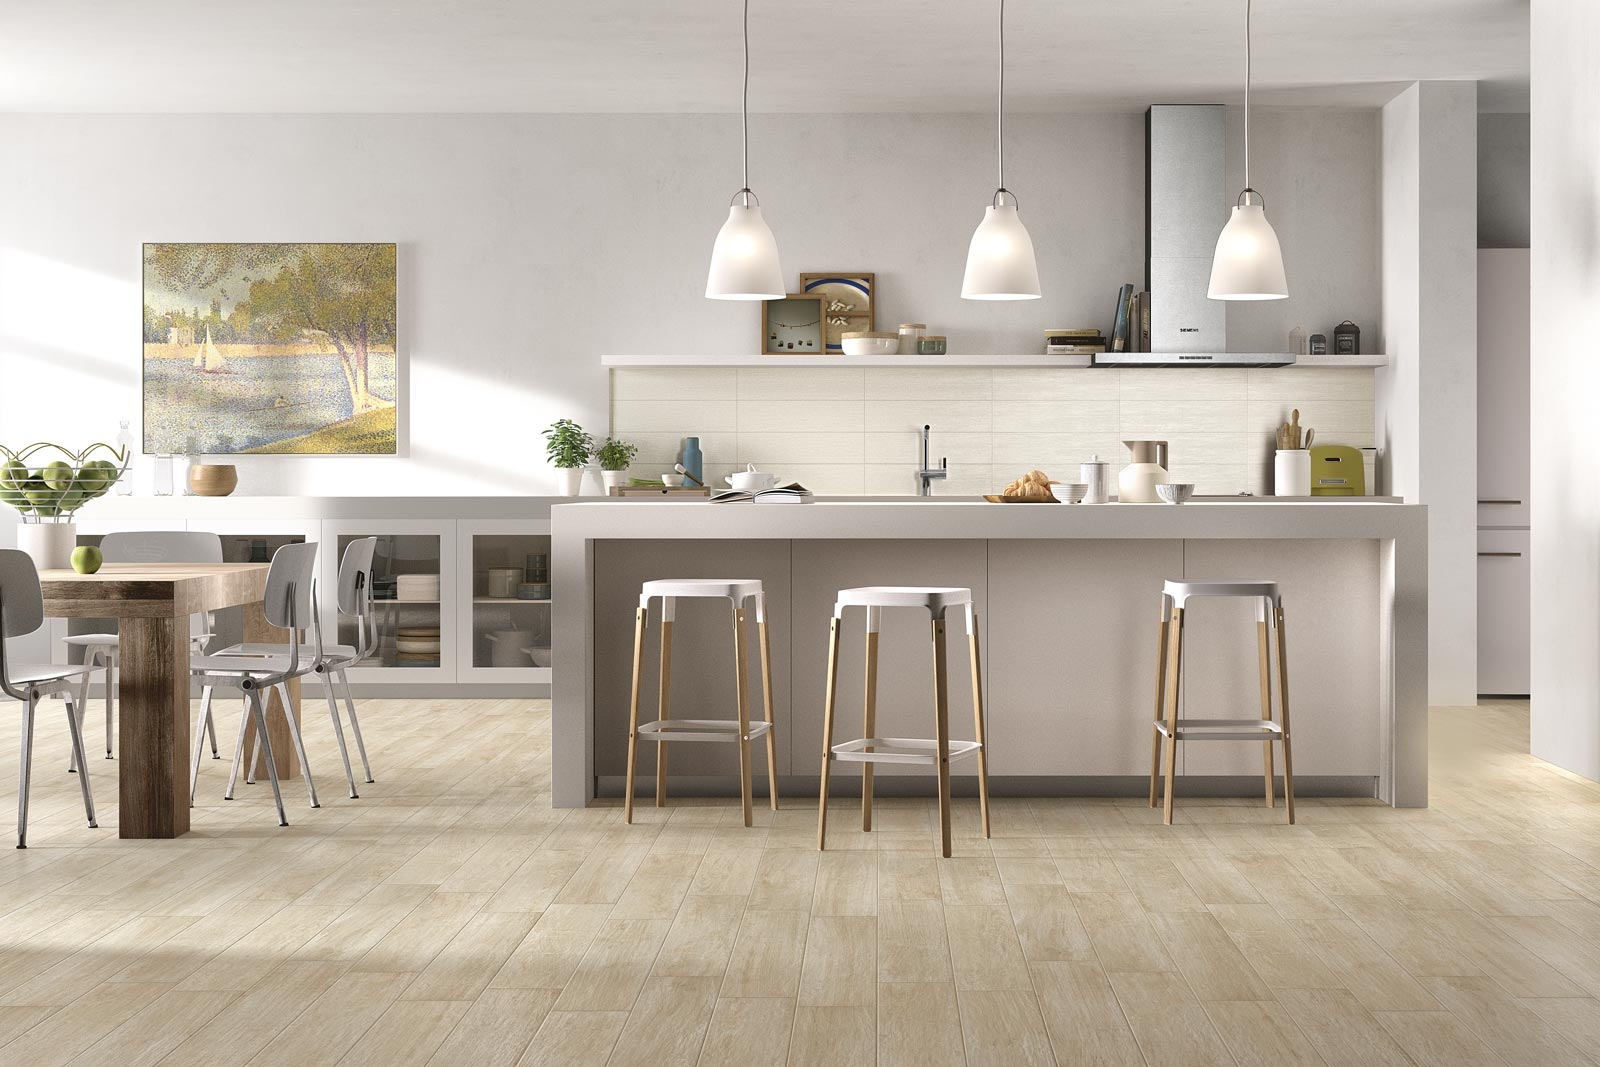 Cucina gialla colore parete cucina rovere grigio sokolvineyard